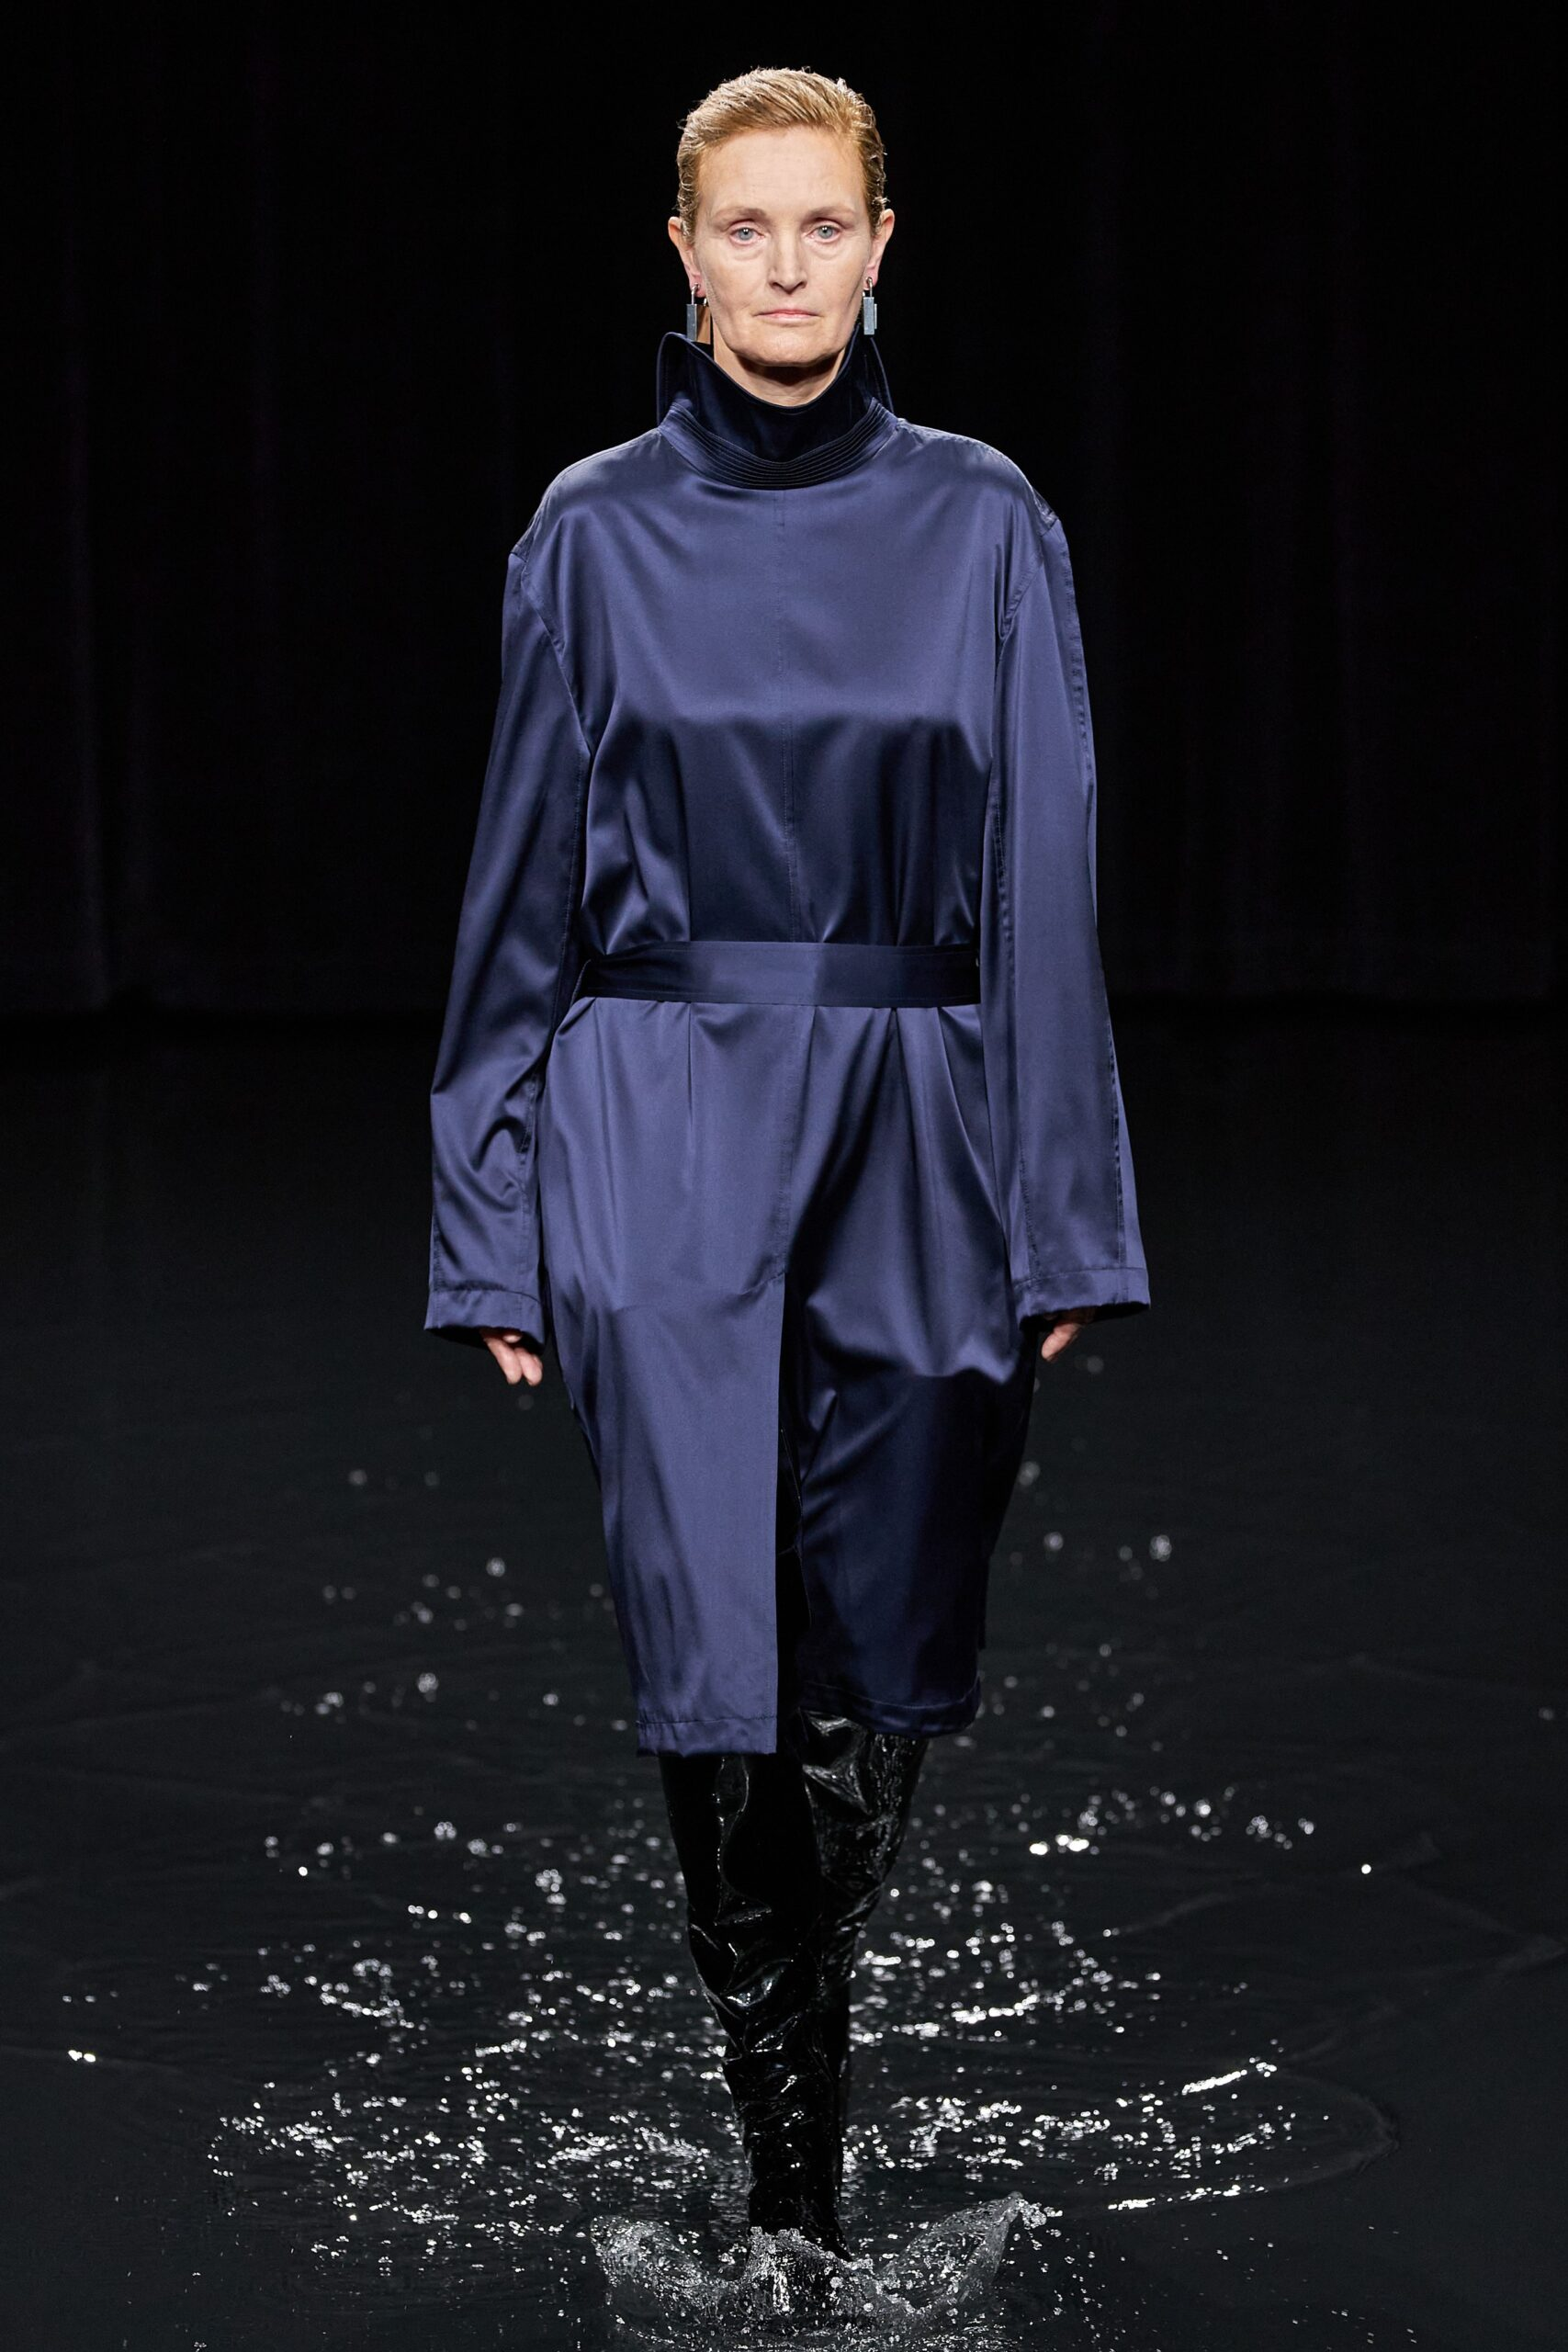 Balenciaga Fall 2020 ready-to-wear